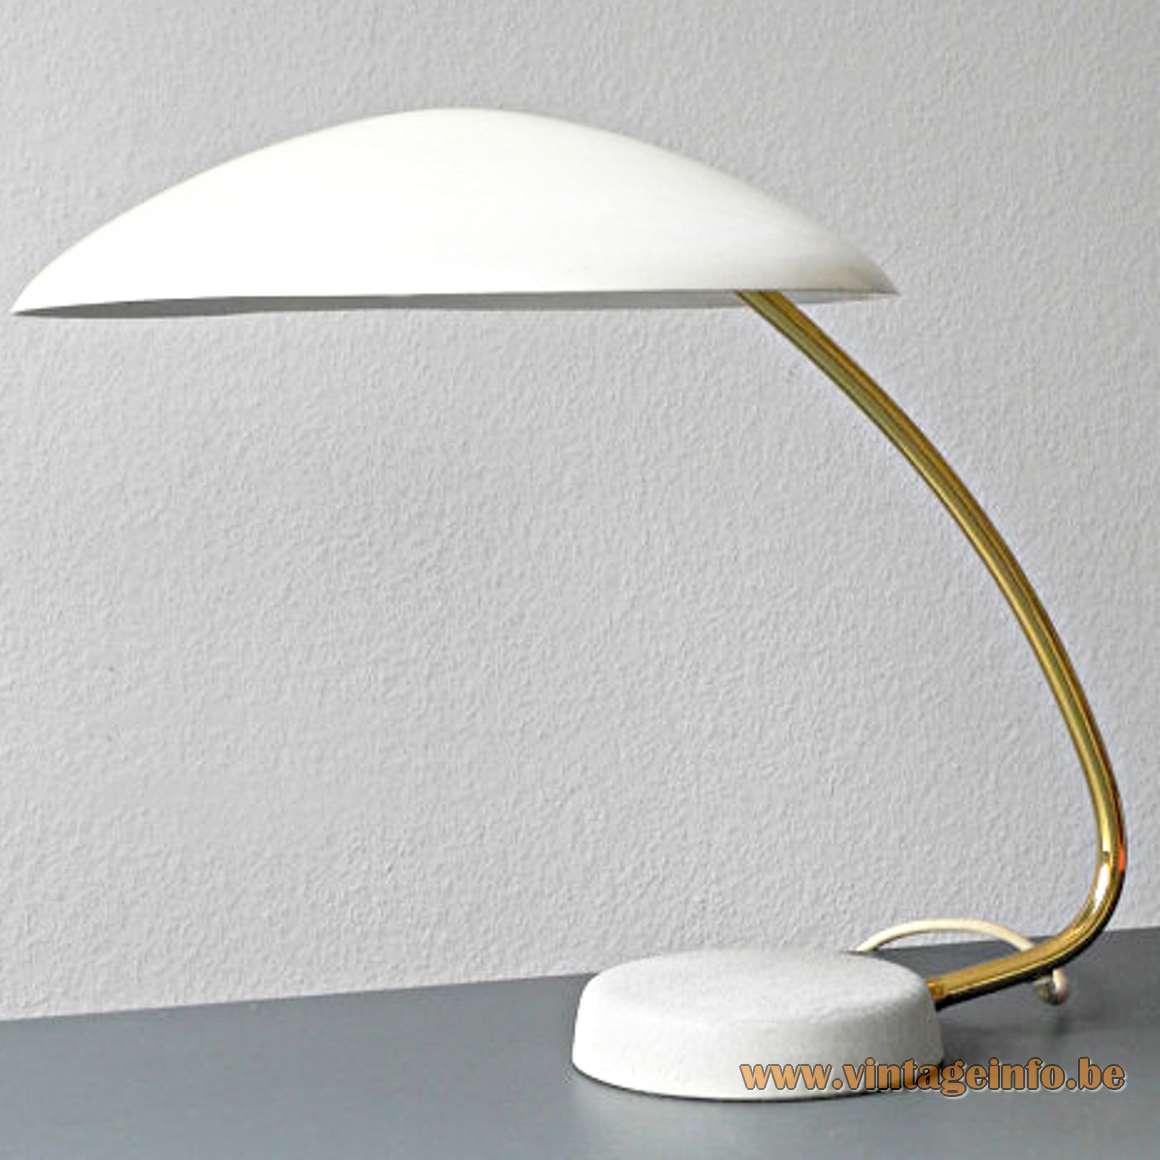 Gebrüder Cosack UFO desk lamp cast iron base brass rod white aluminium lampshade Germany 1950s 1960s